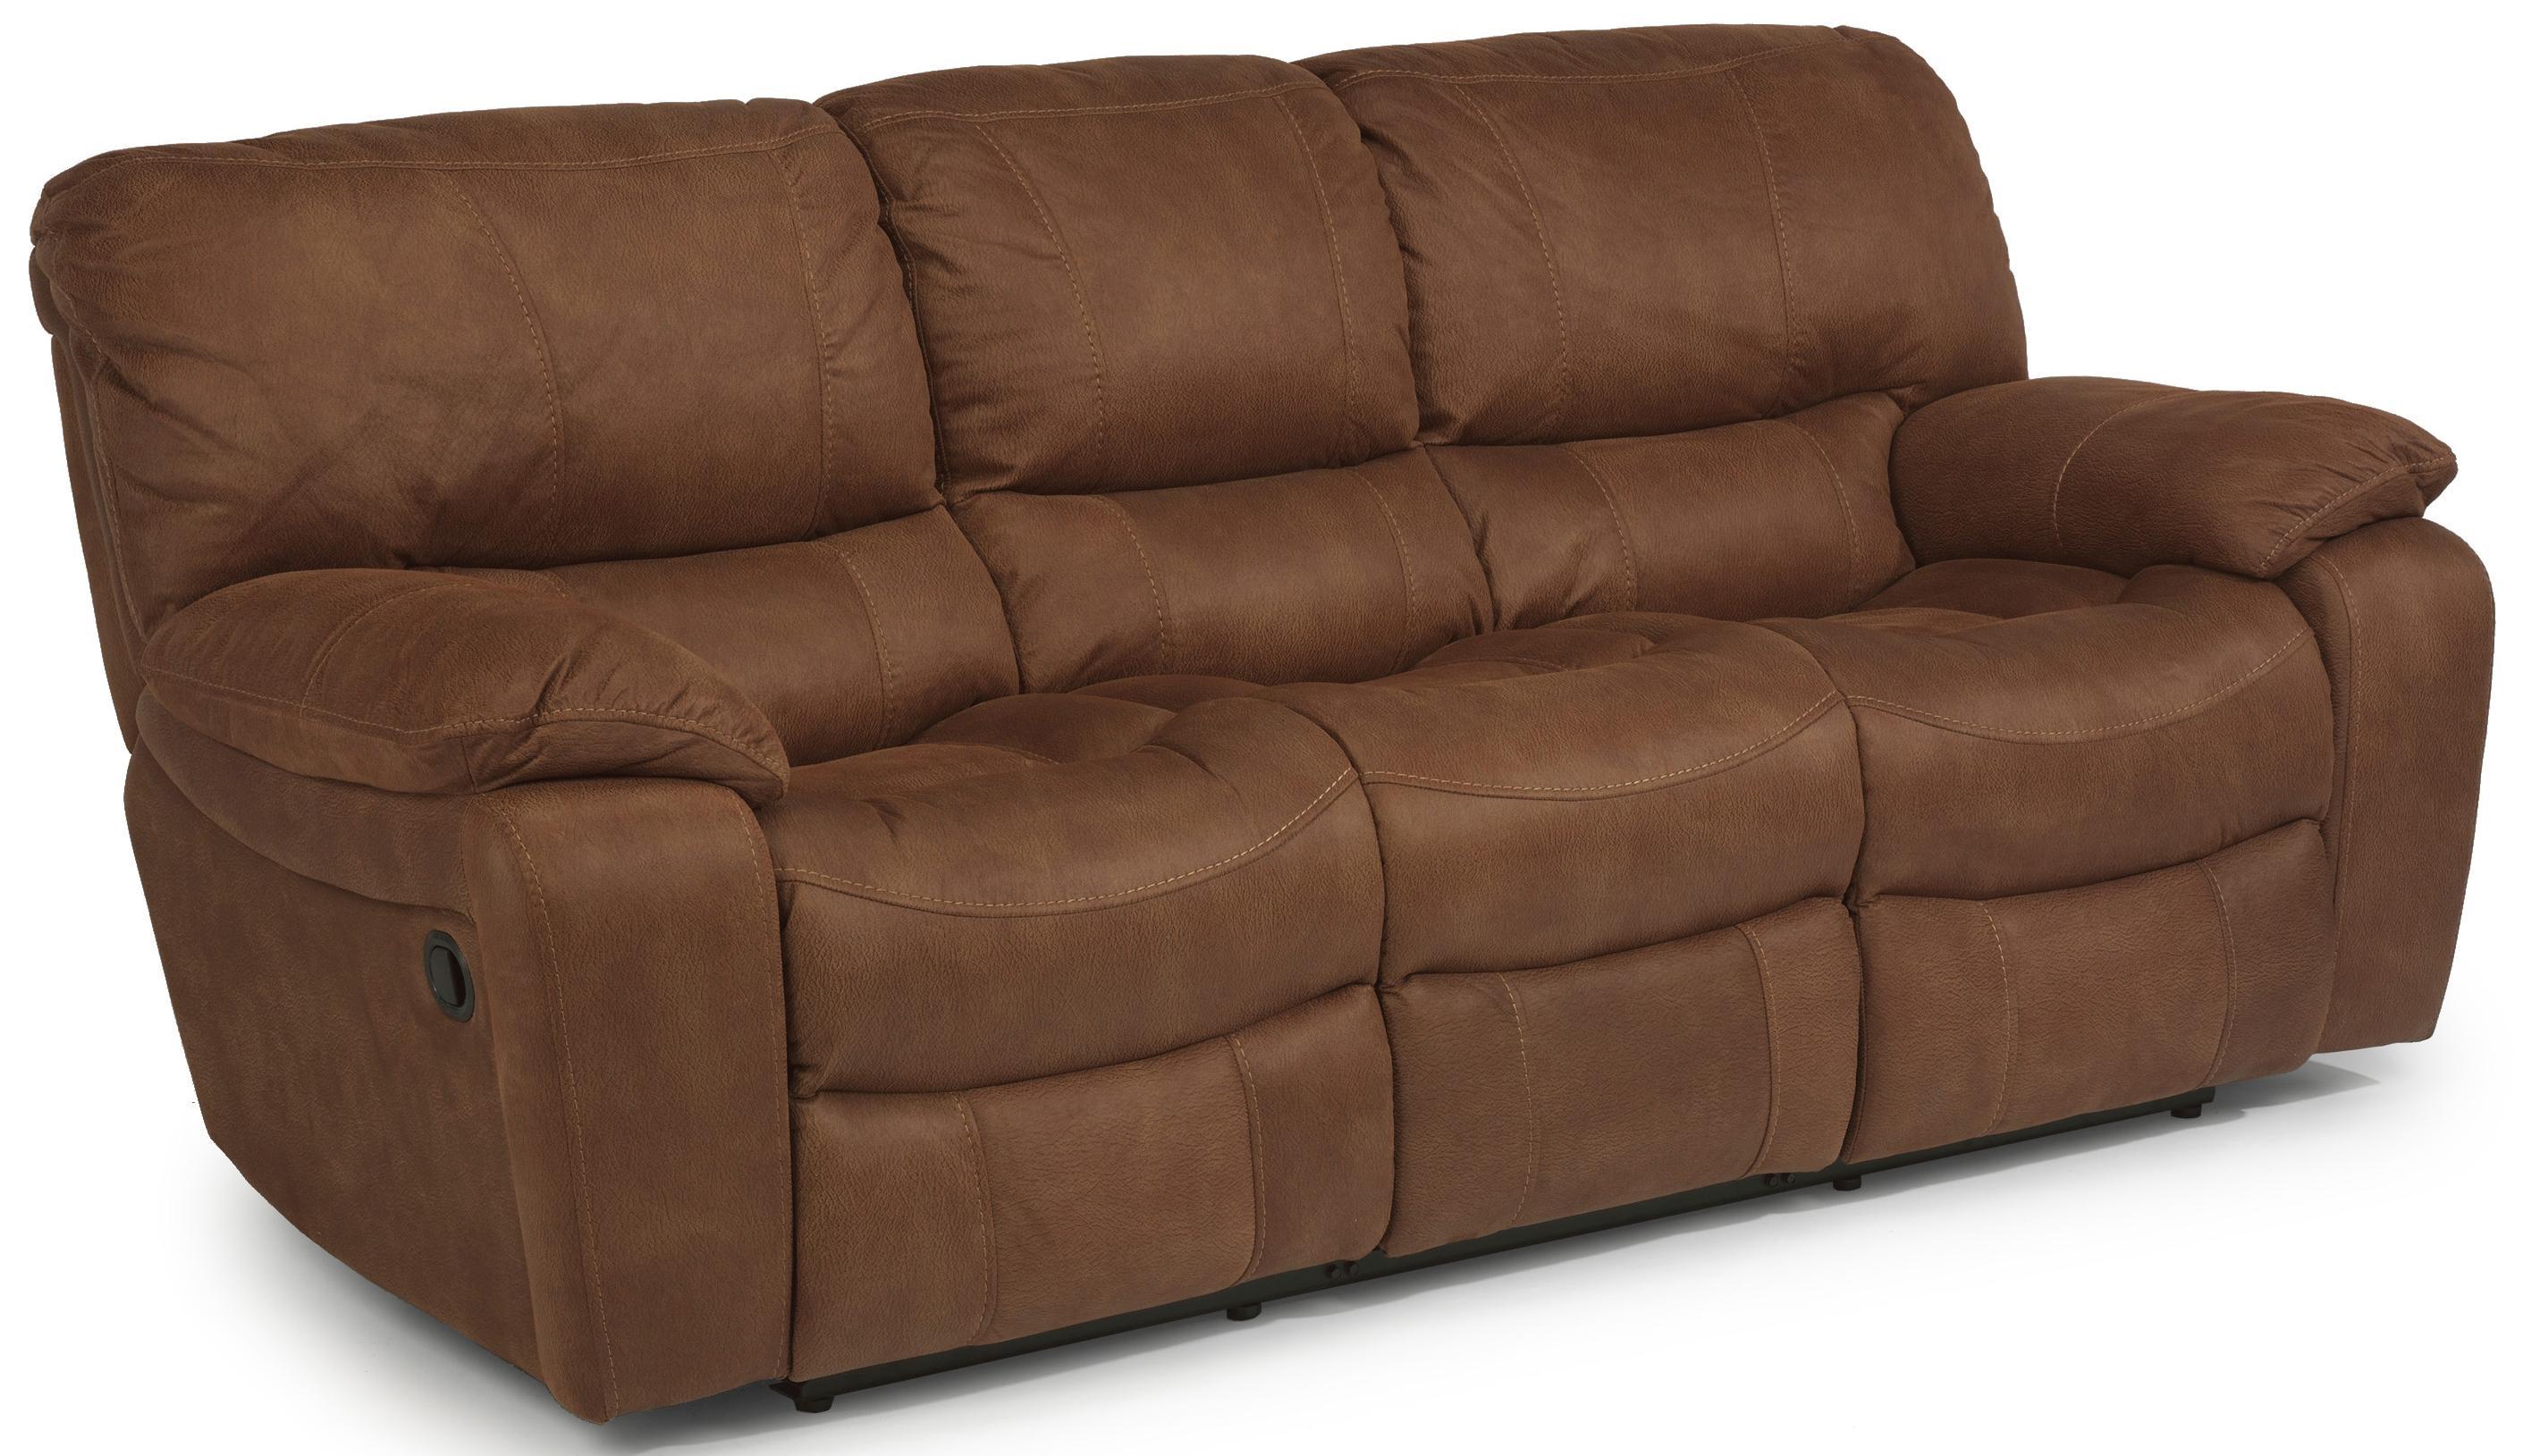 Flexsteel Latitudes Grandview Power Reclining Sofa With